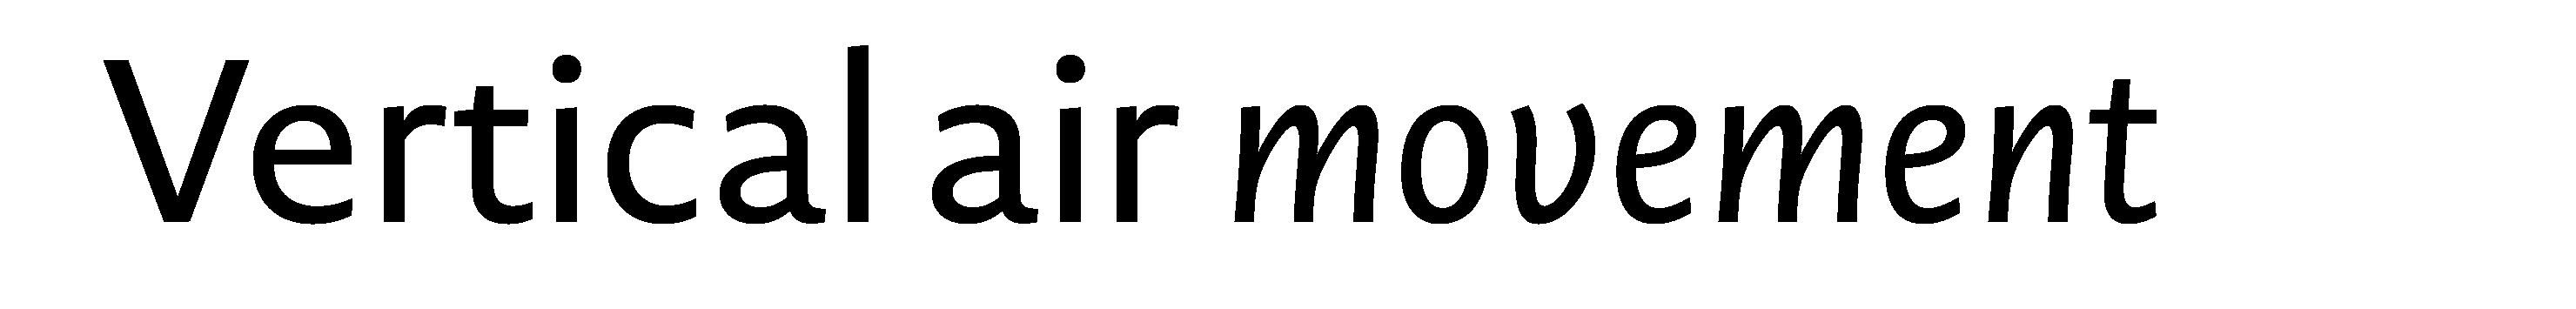 Typeface Novel Sans D03 Atlas Font Foundry